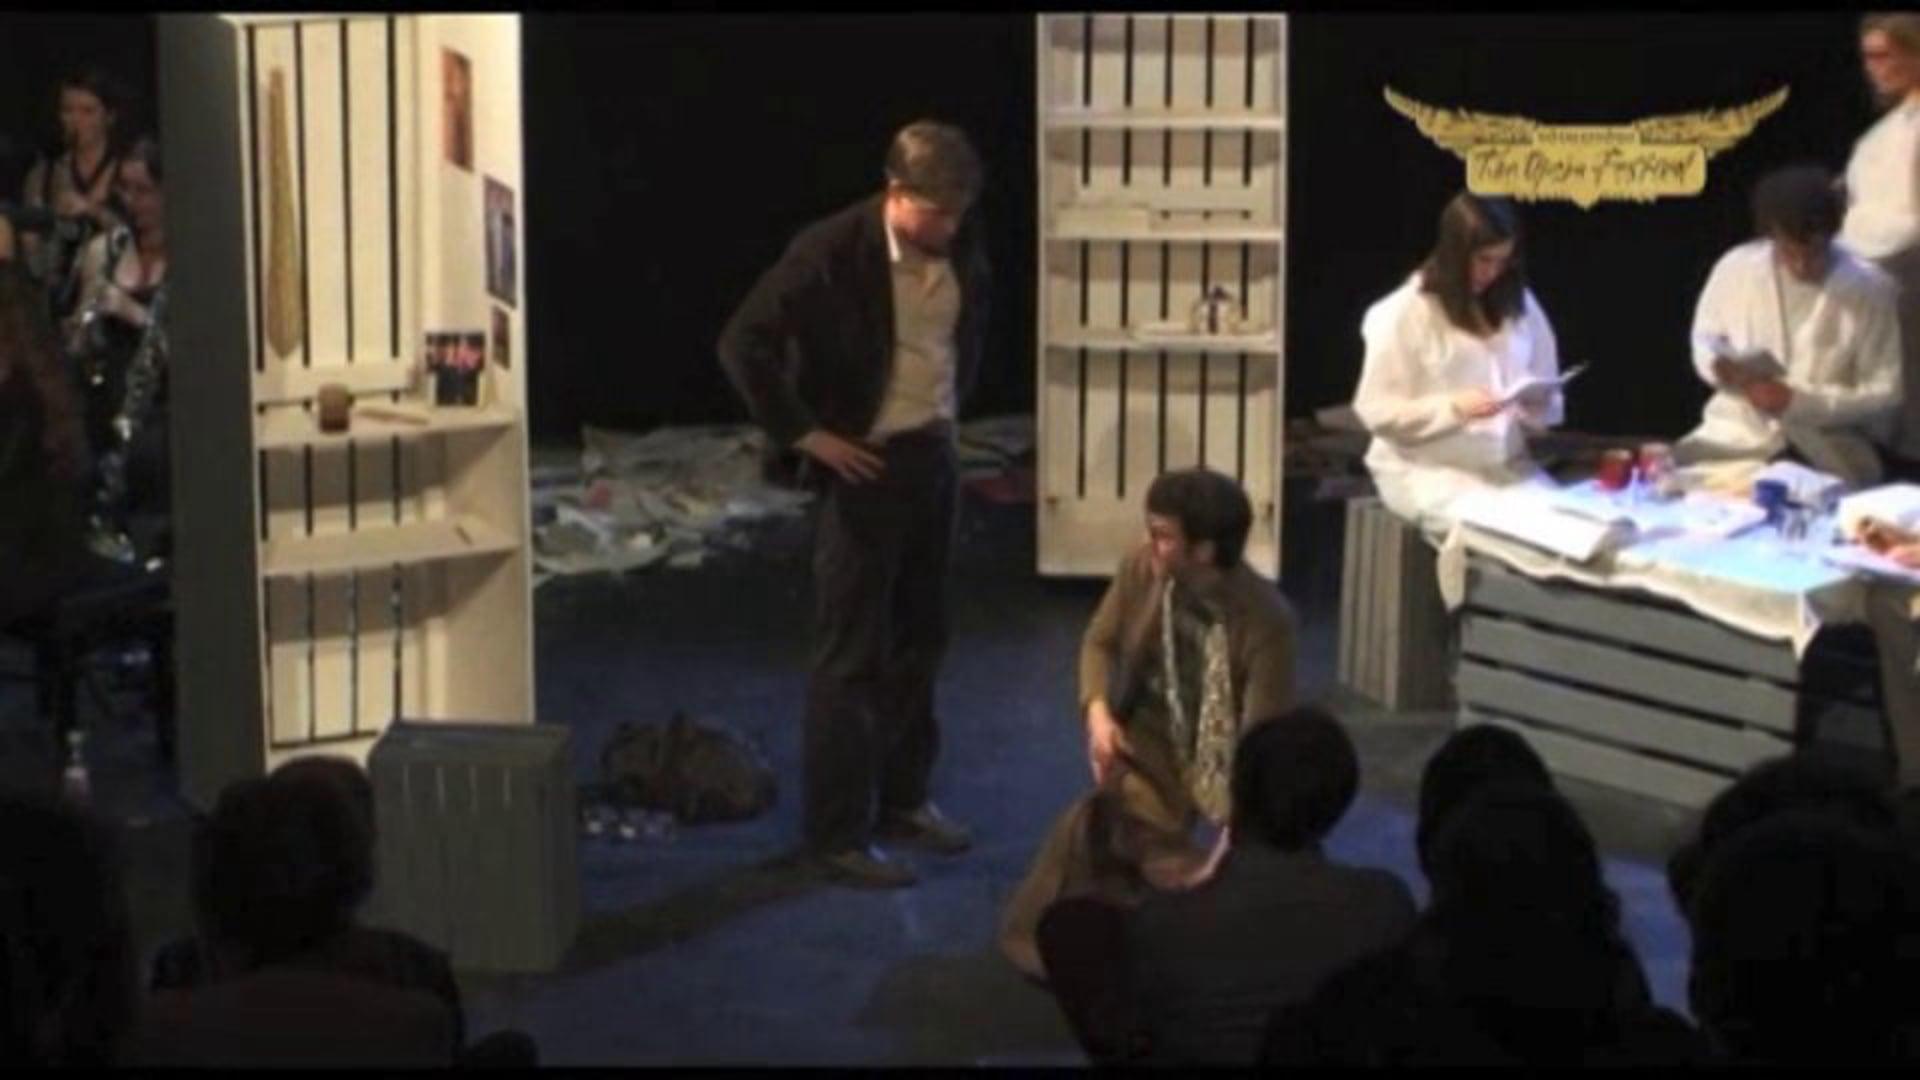 MICROmegas - Scene three